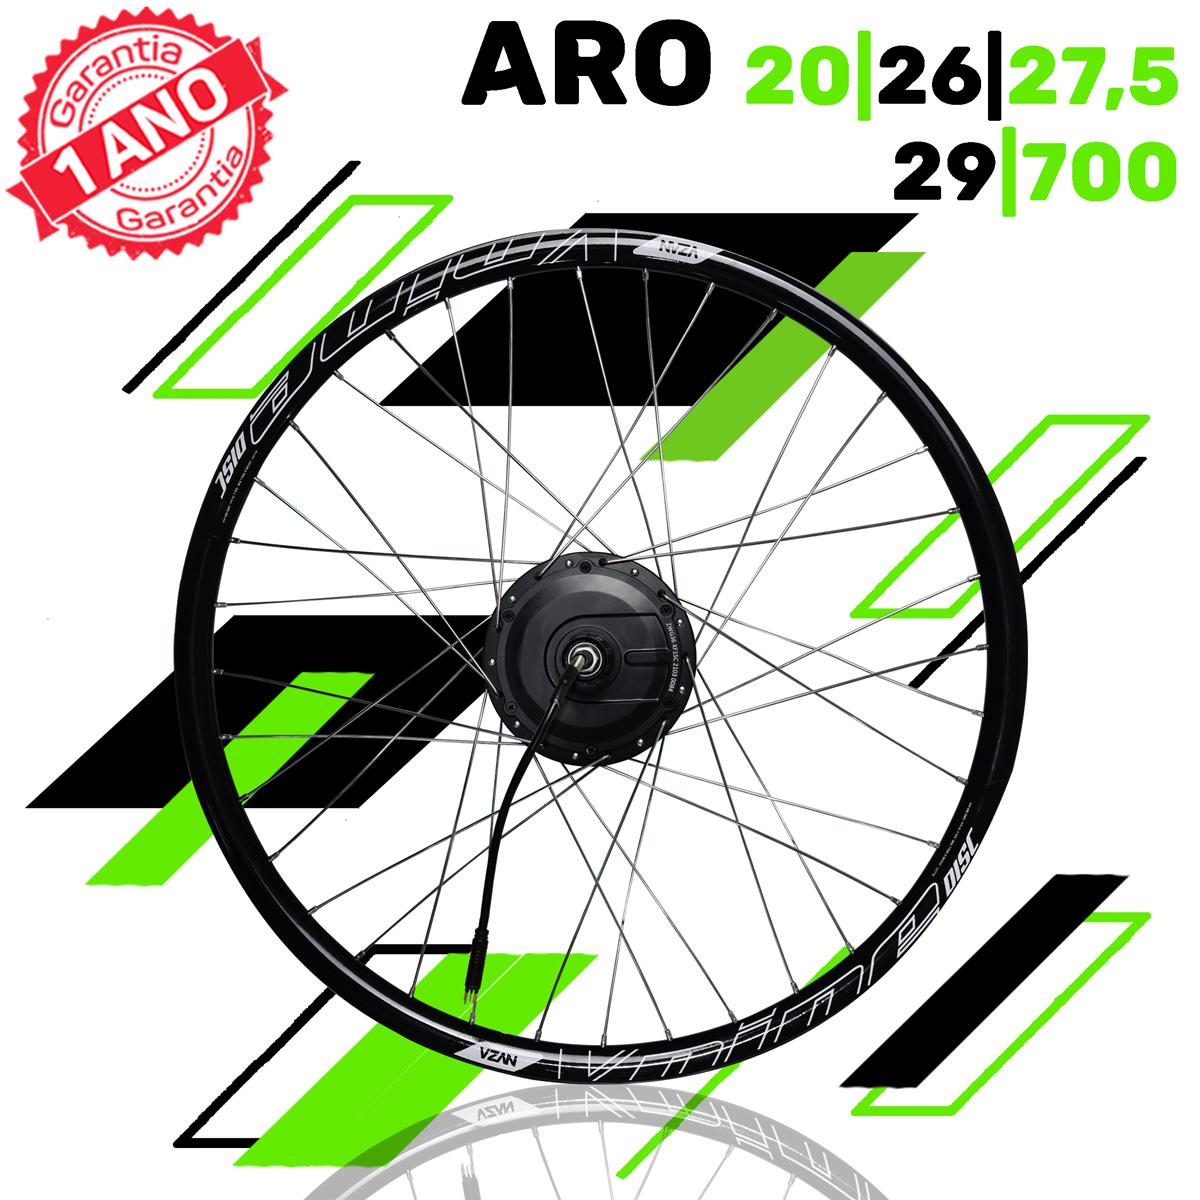 Kit Elétrico para Bicicleta - TecBike - 350 Watts 36V - Aro 700